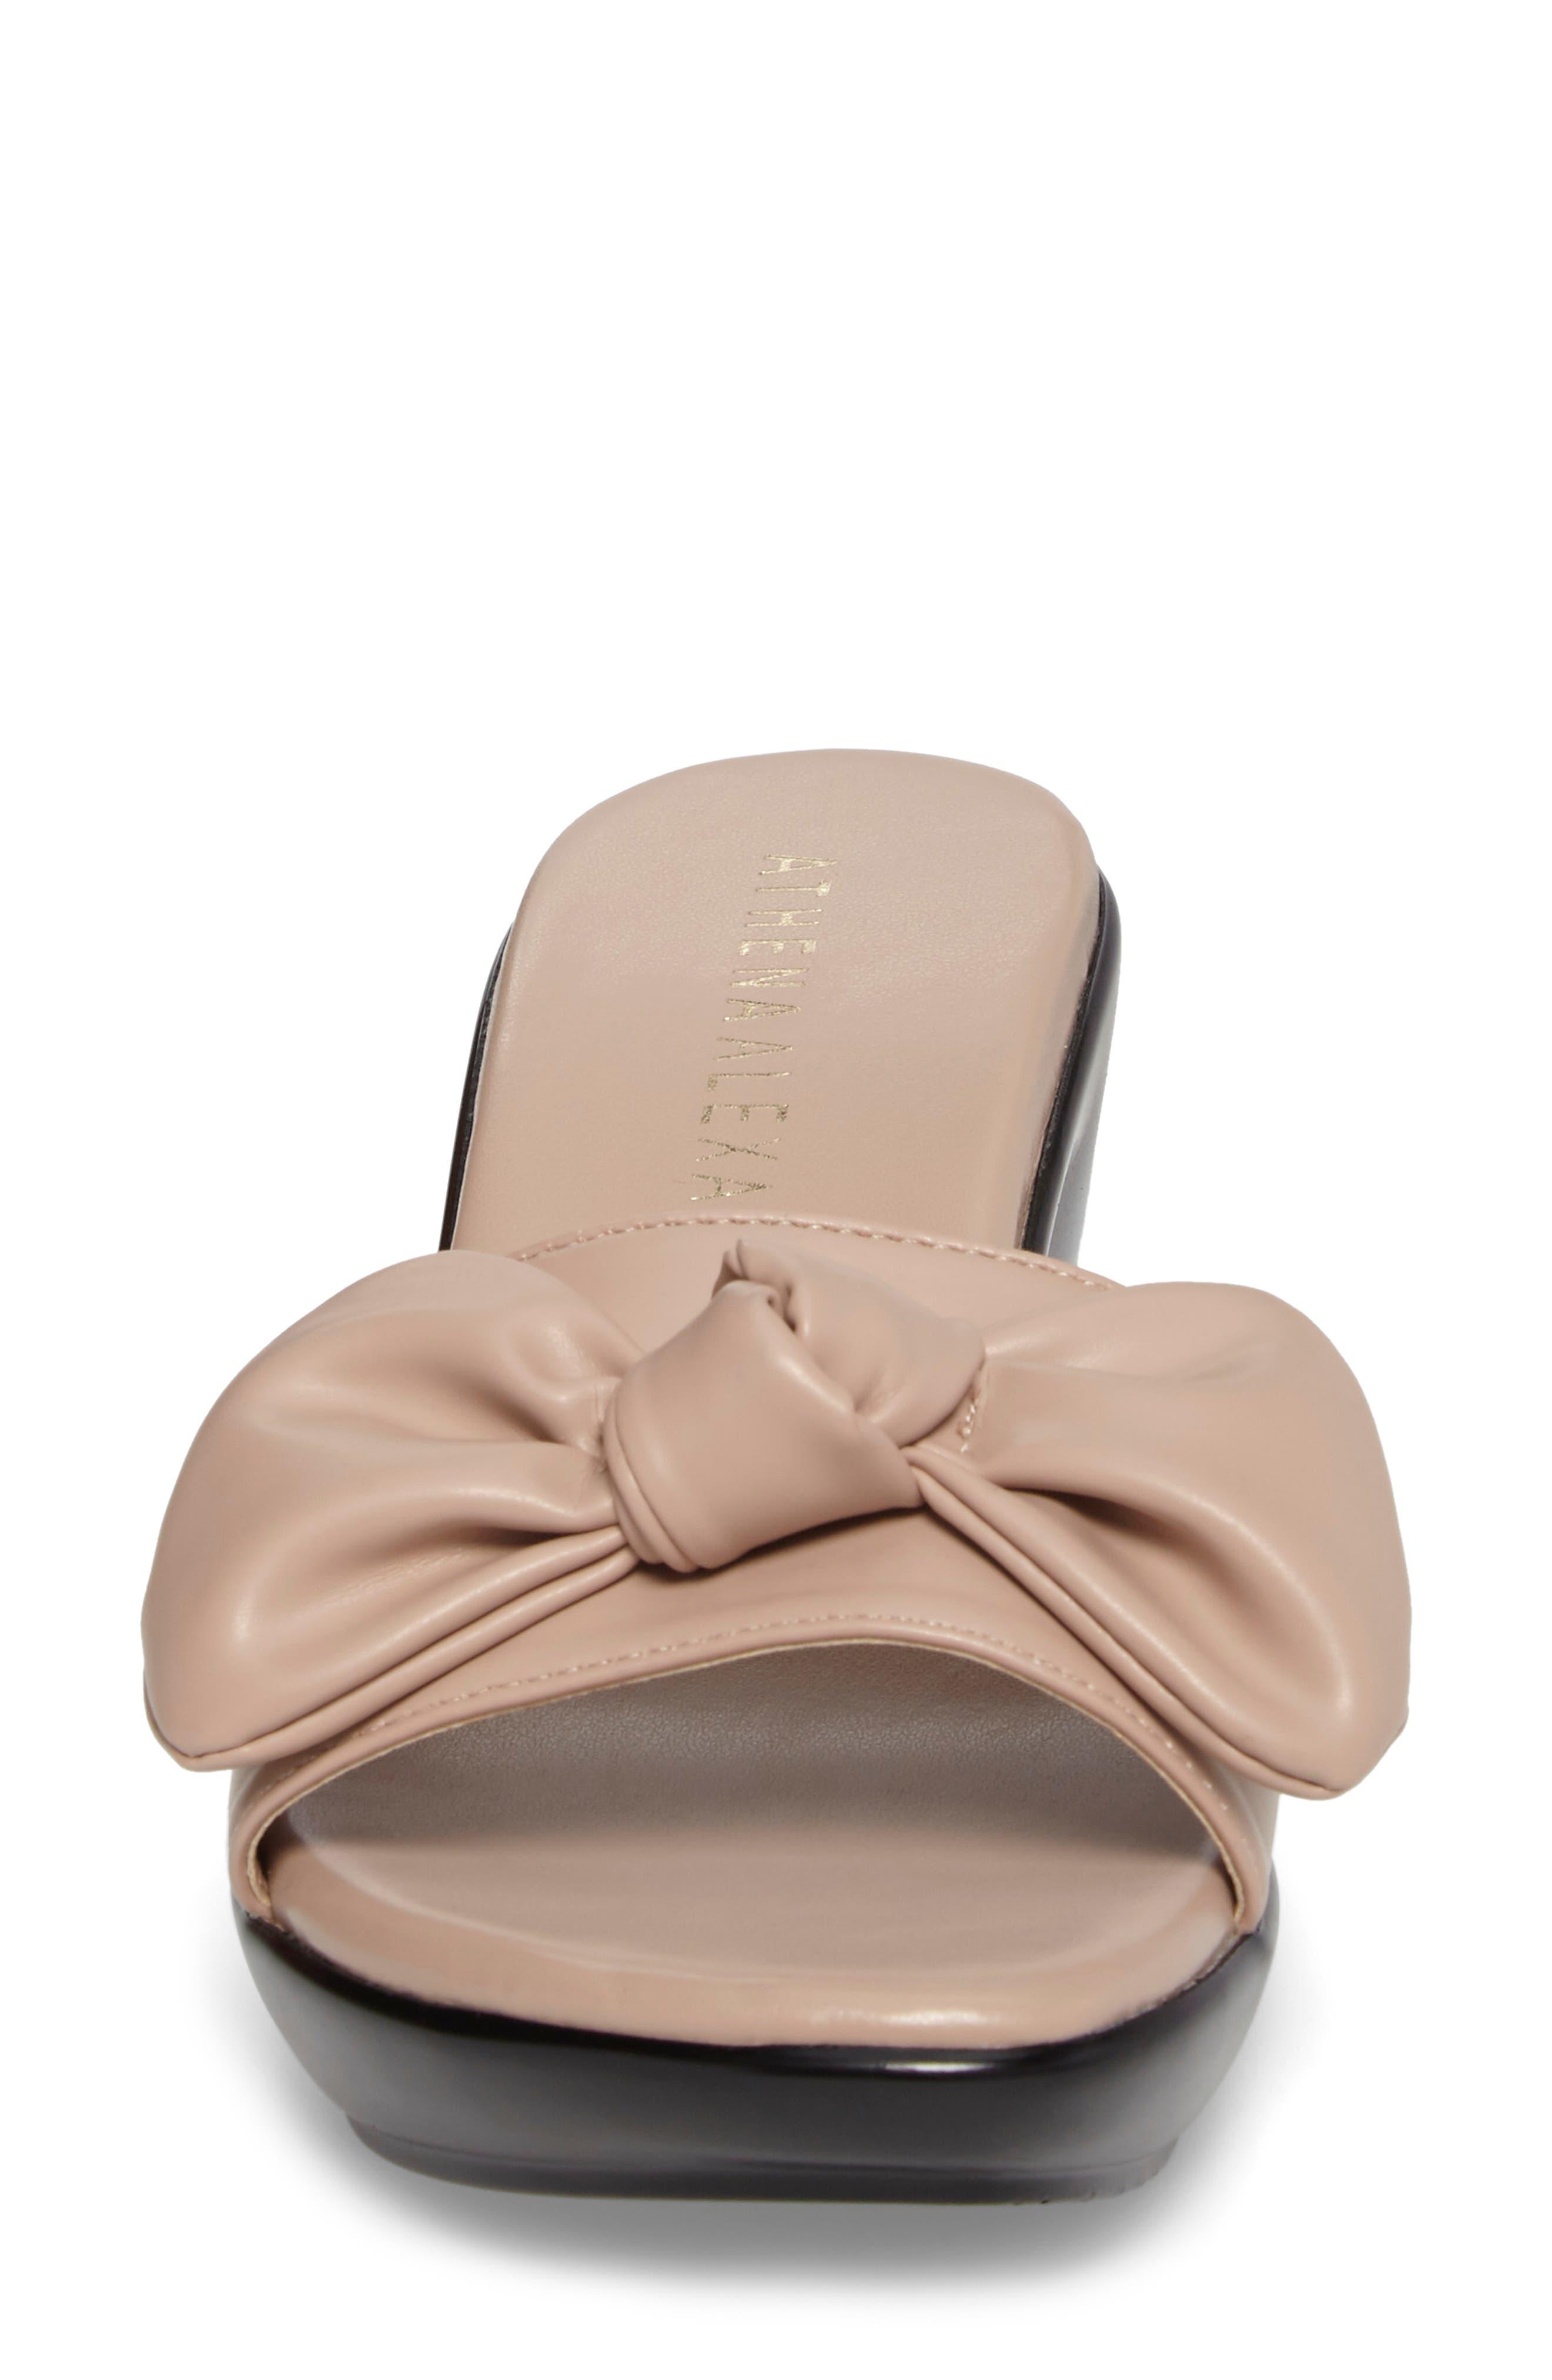 Pattye Knotted Slide Sandal,                             Alternate thumbnail 4, color,                             Blush Faux Leather